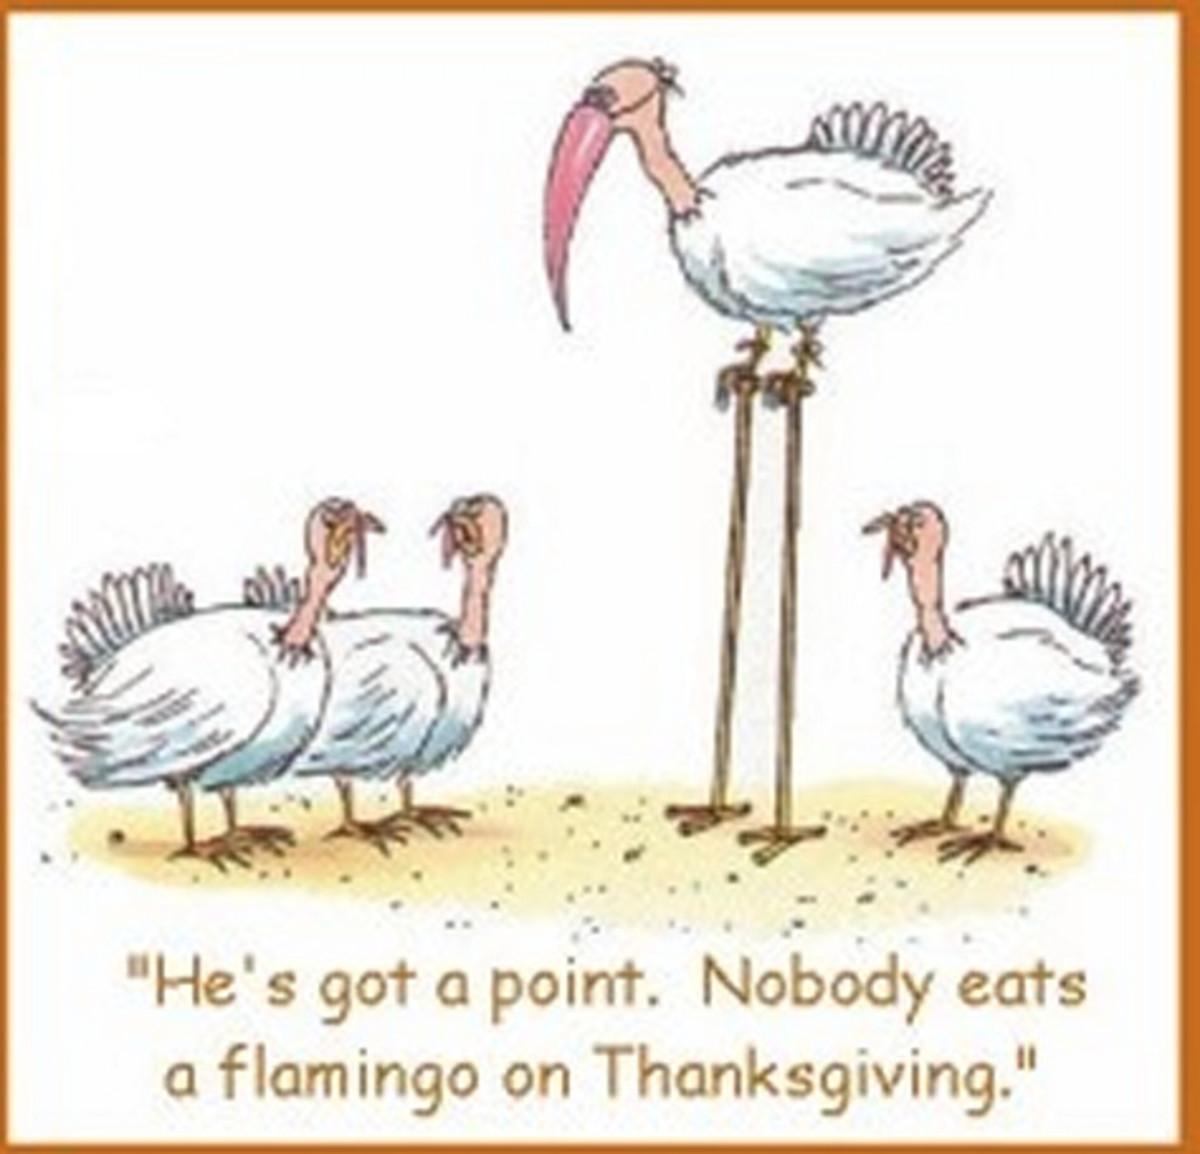 Image credit: http://lumdimsum .com/2012/11/22/on-thanksgiving-thank-goodness-were-not-turkeys/